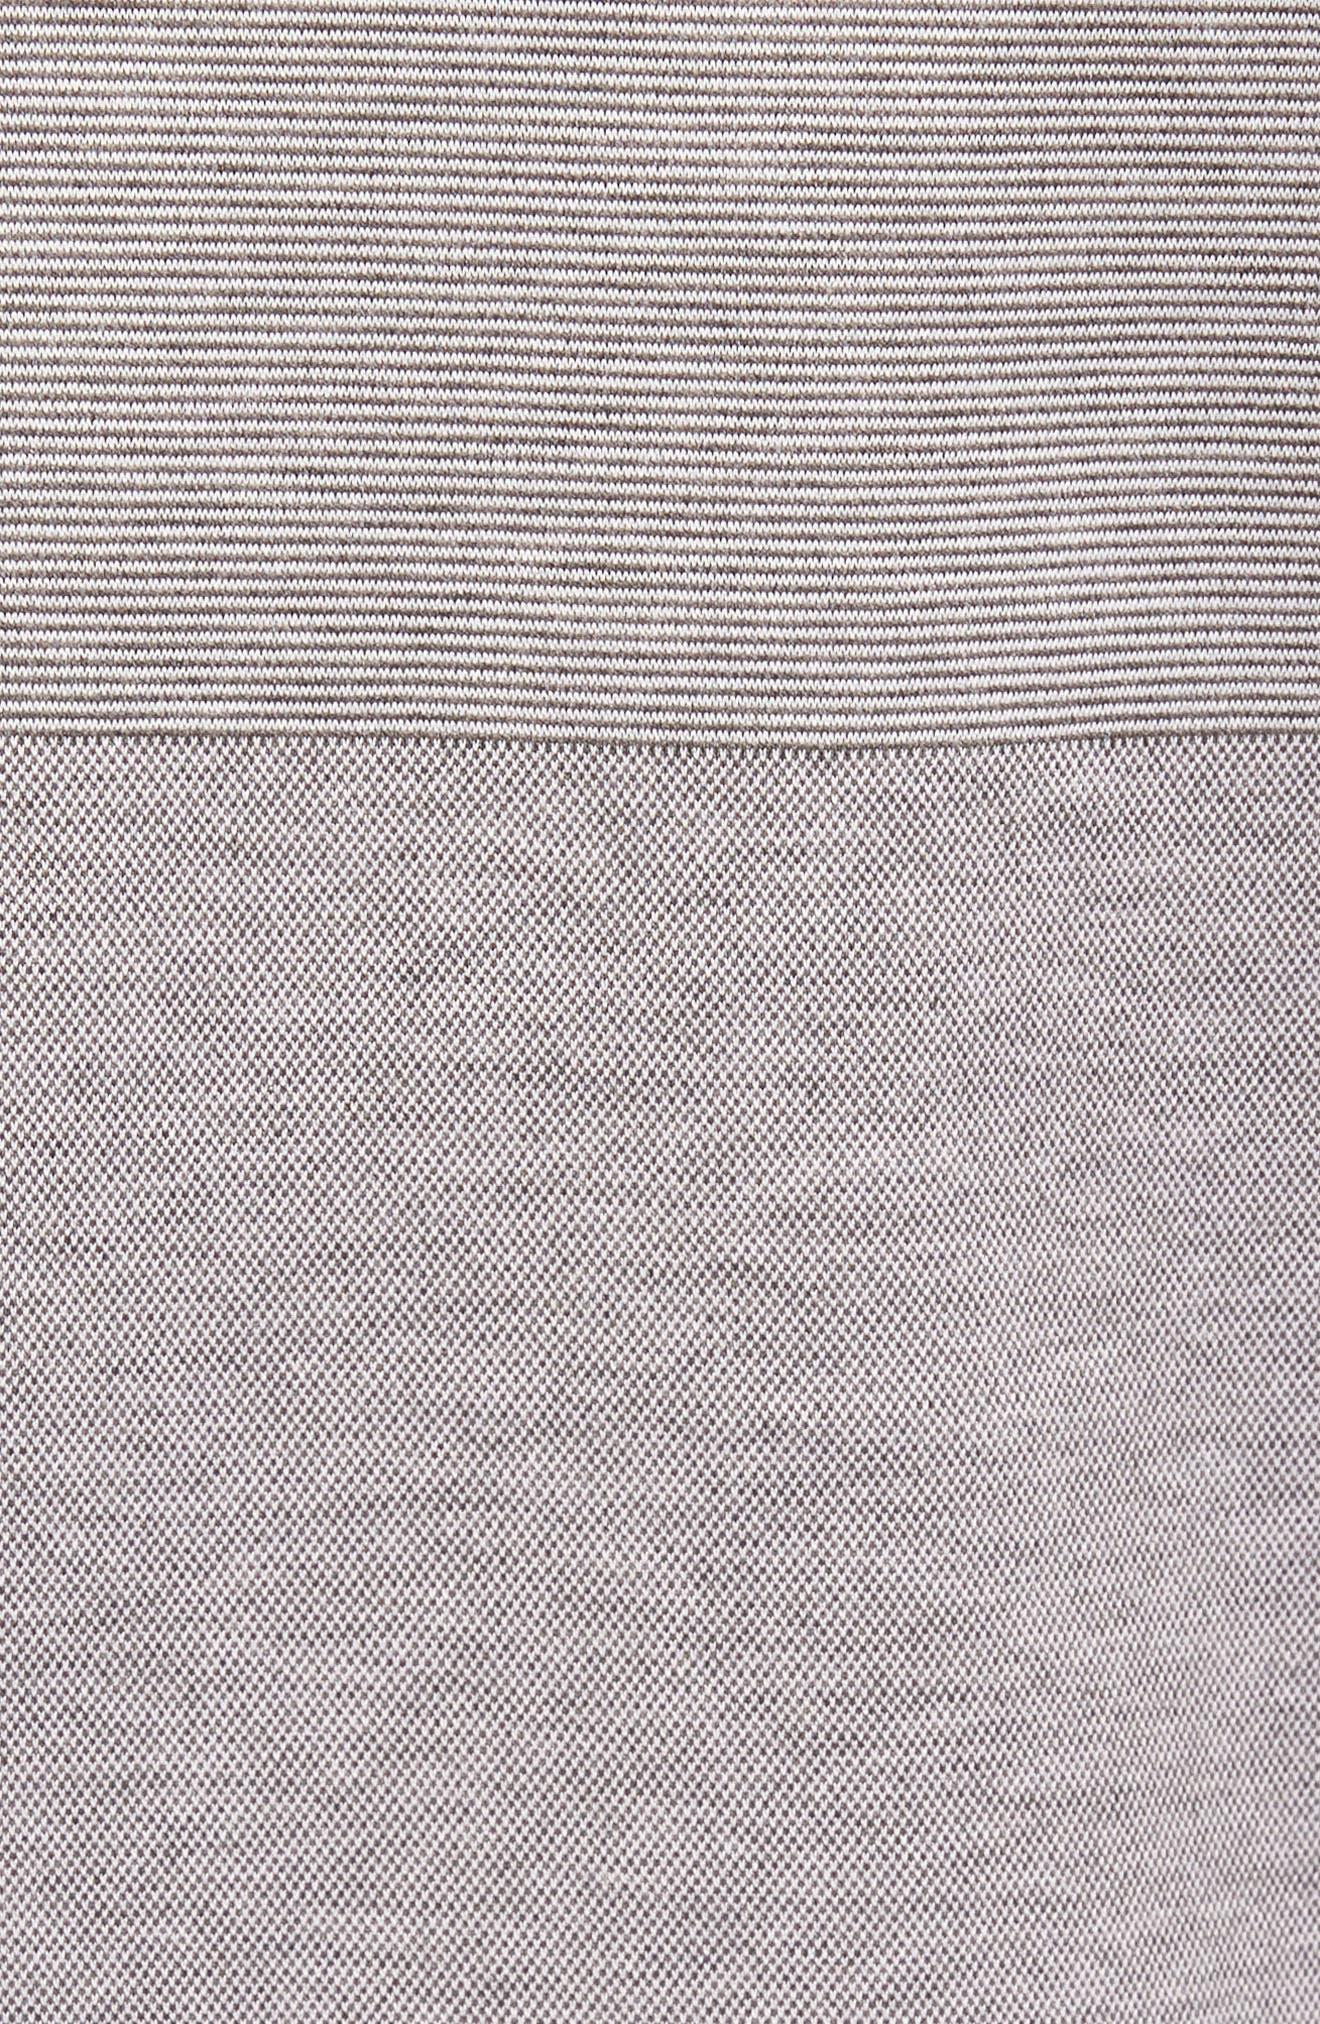 Slim Fit Stripe V-Neck T-Shirt,                             Alternate thumbnail 5, color,                             030